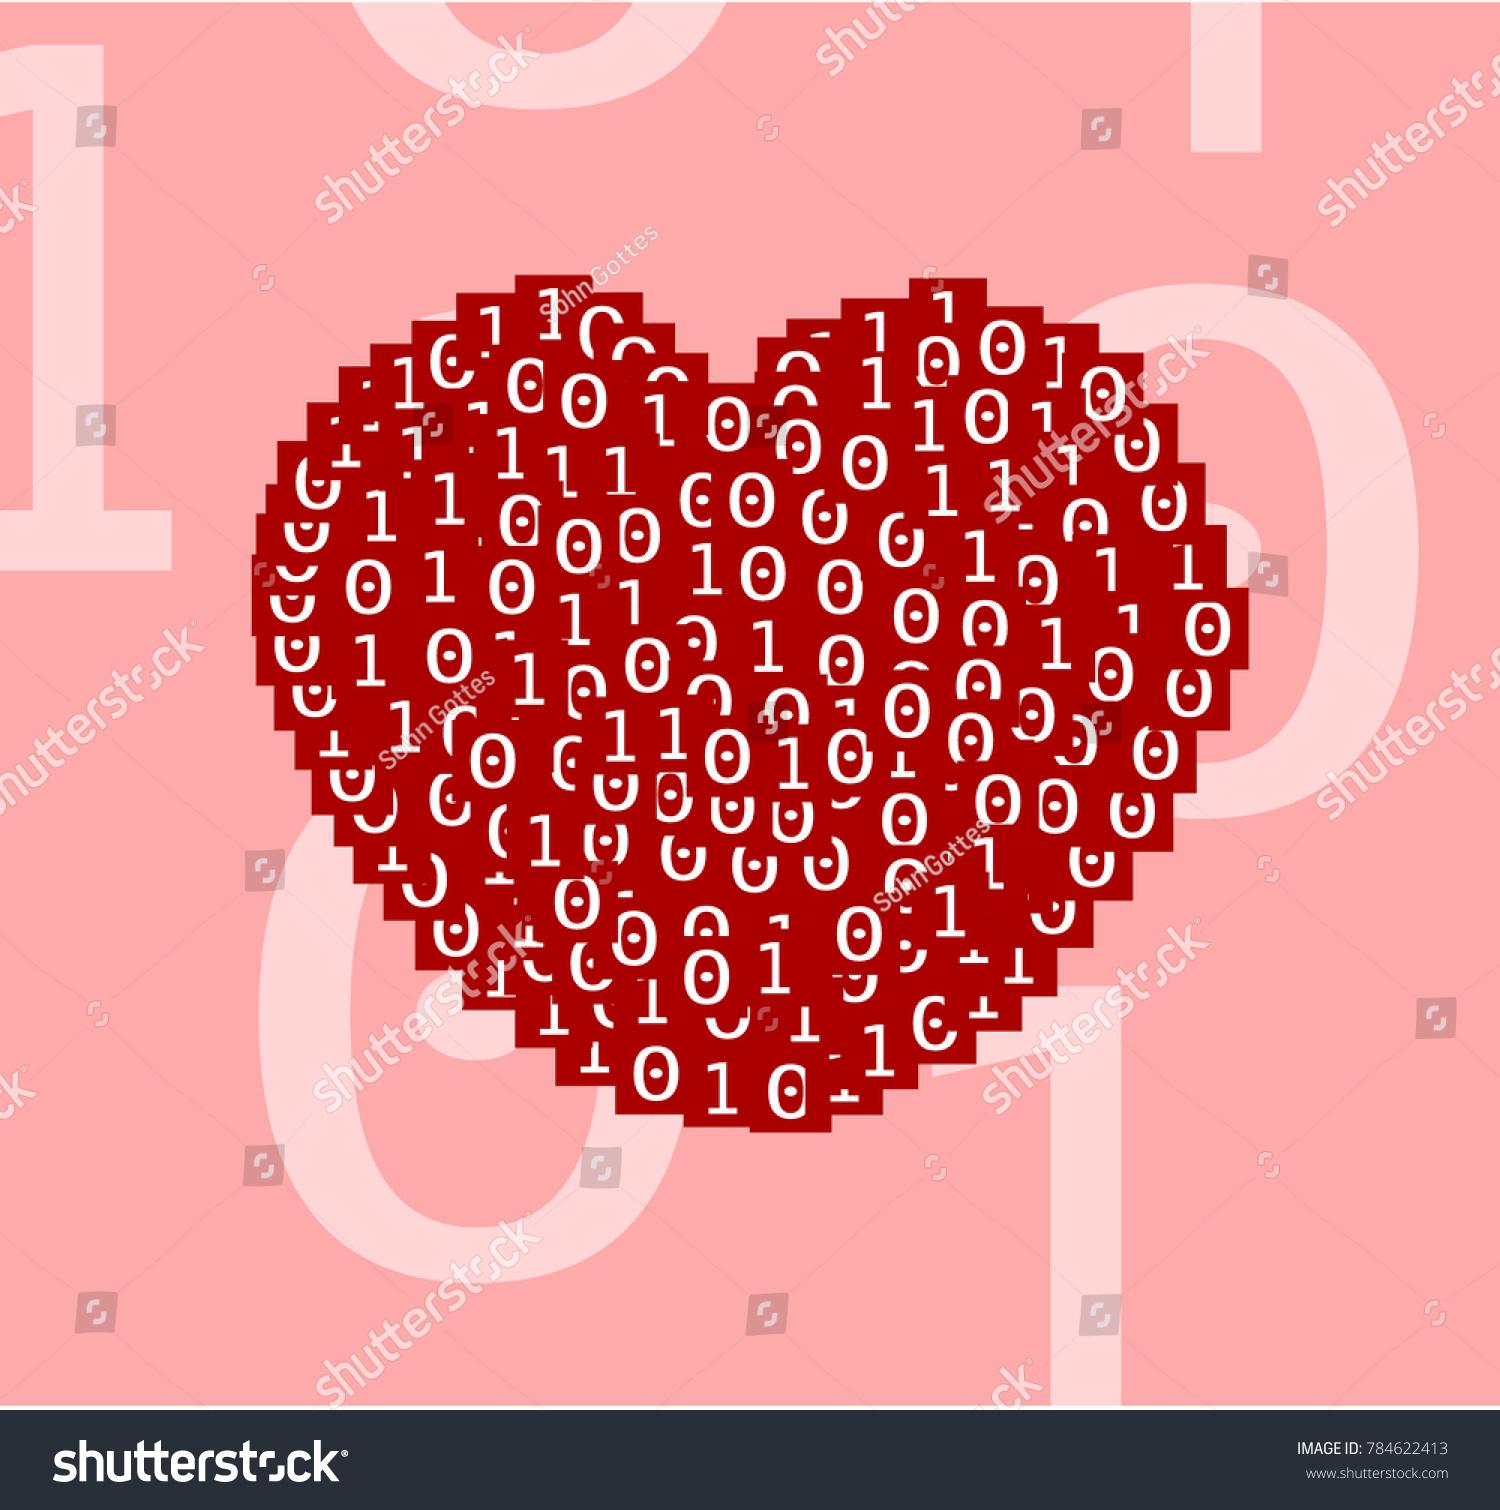 stock-vector-heart-drawn-of-analog-zero-